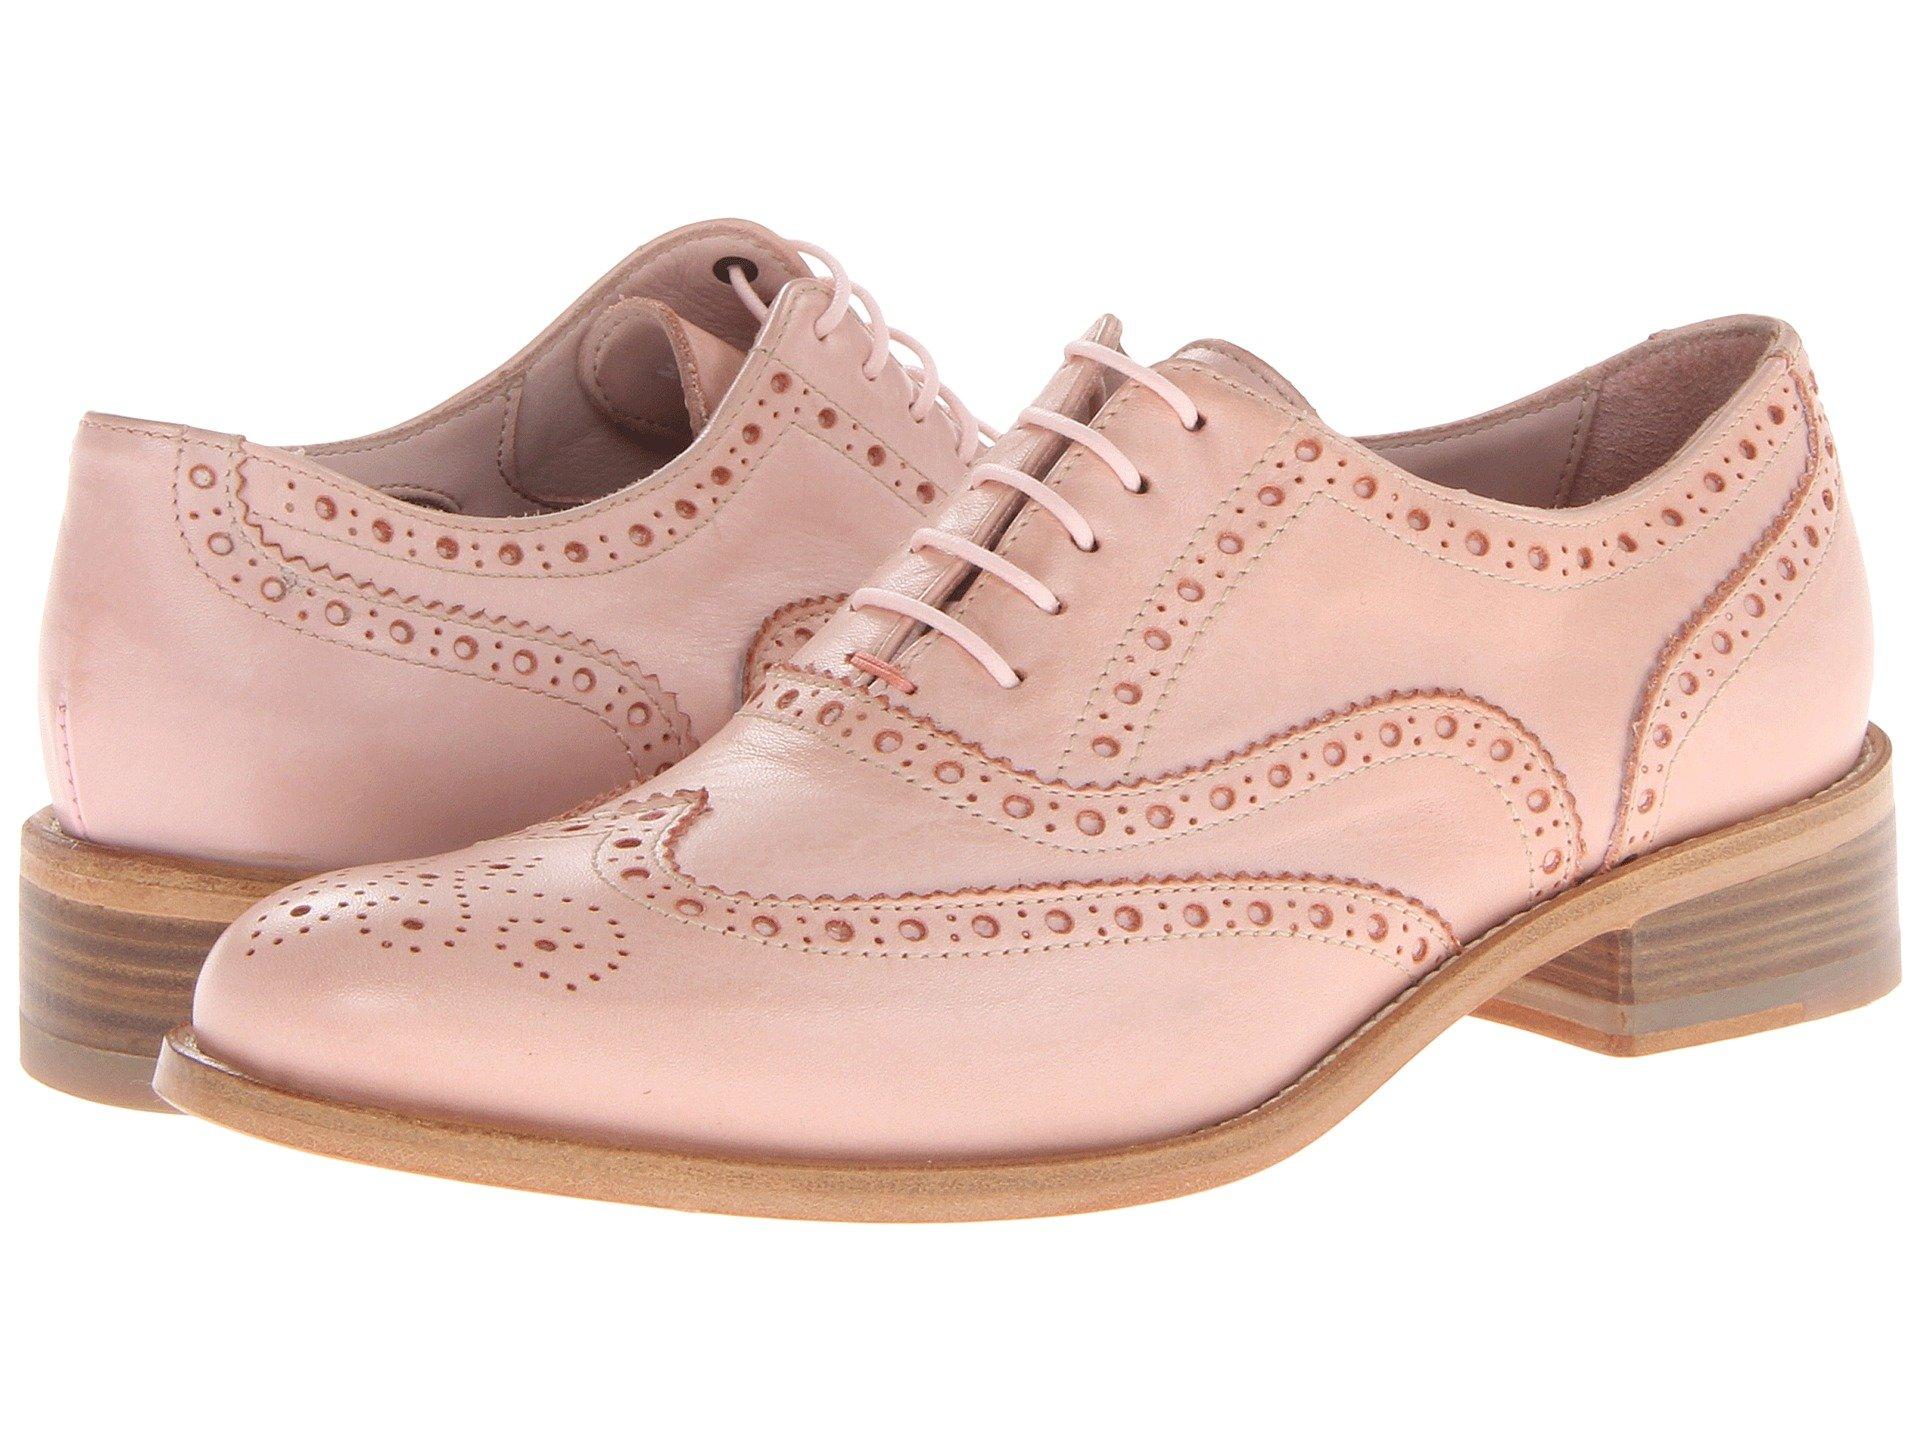 pink brogues womens Shop Clothing